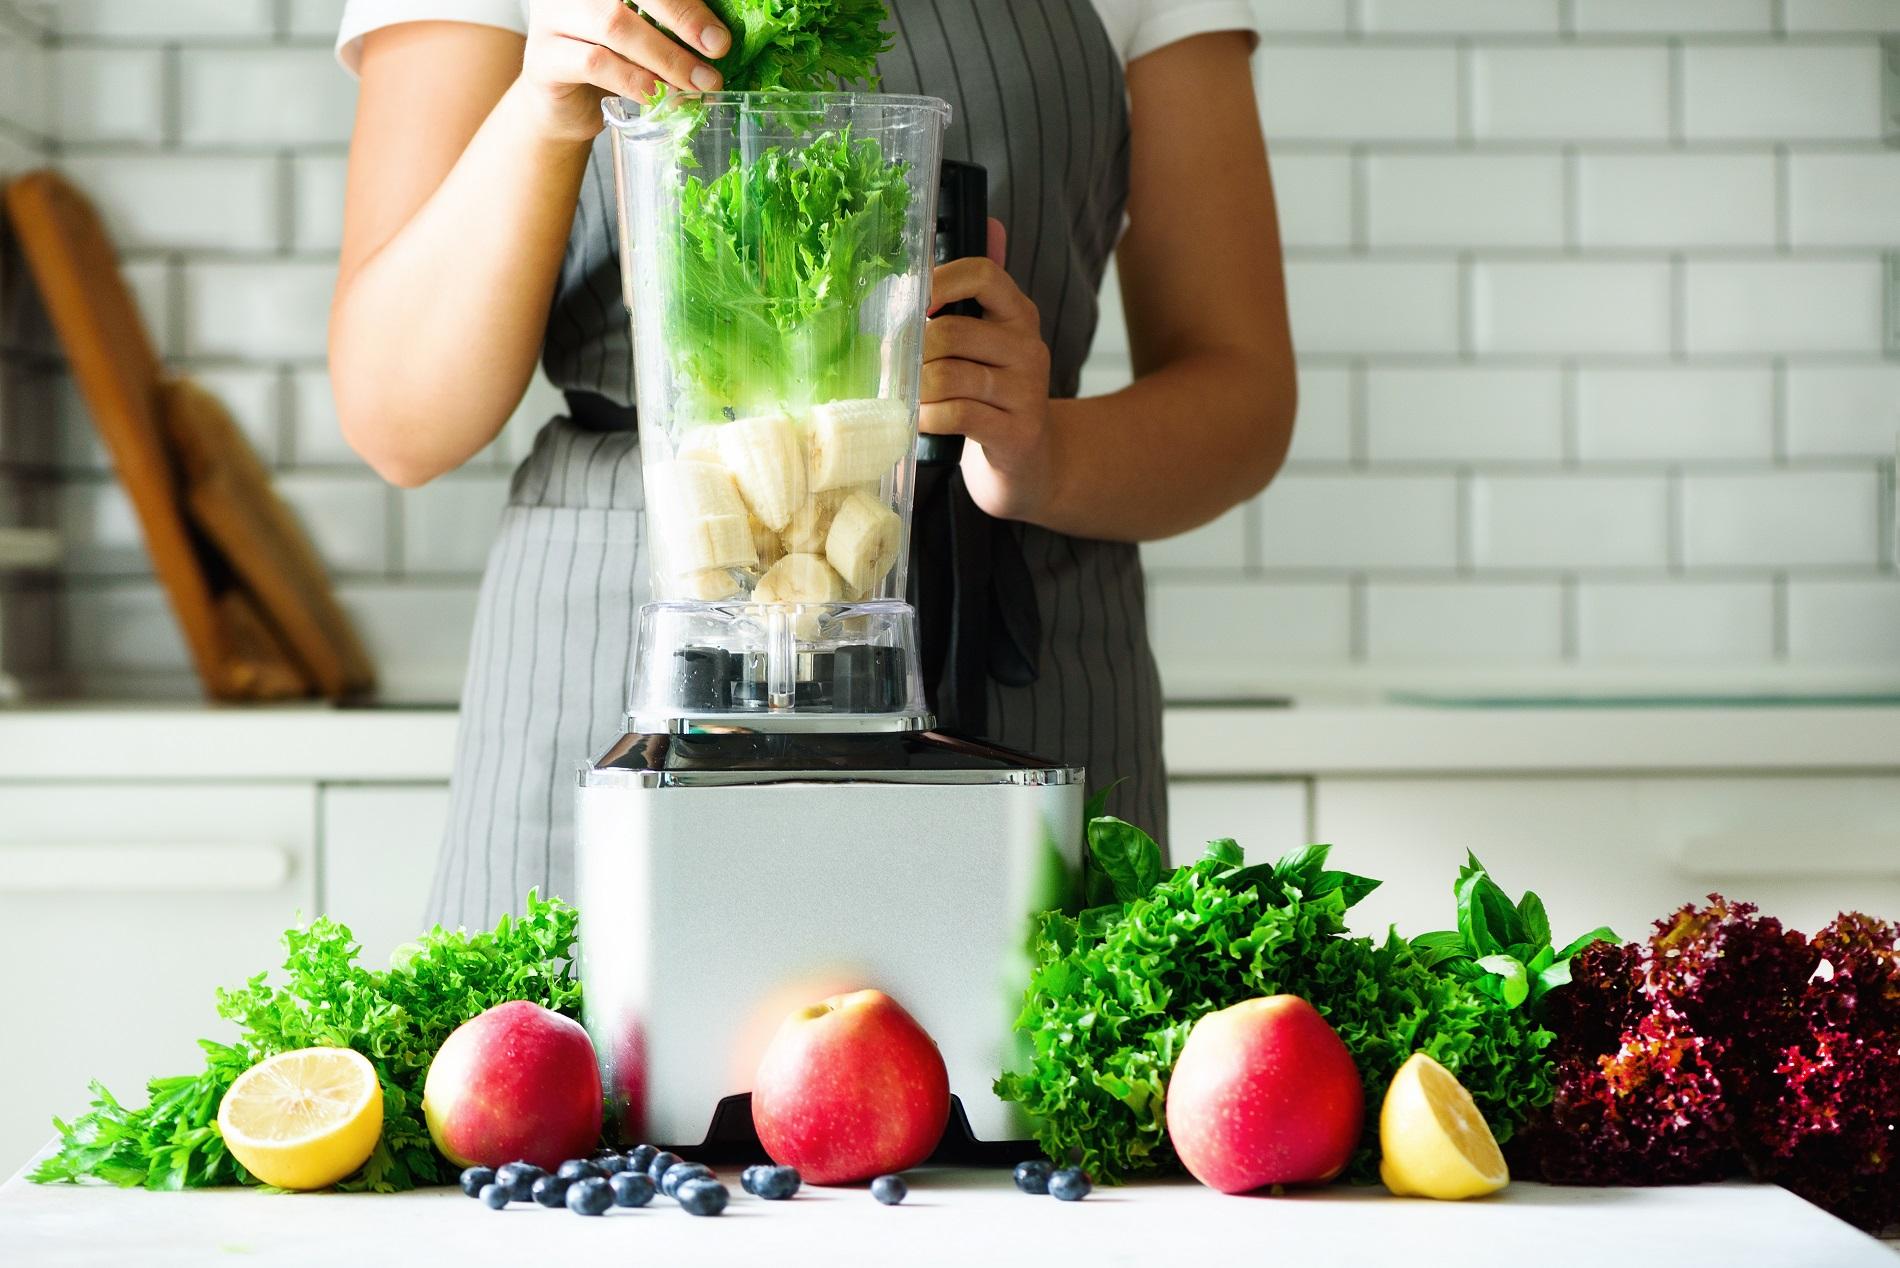 Cucina & Gastronomia